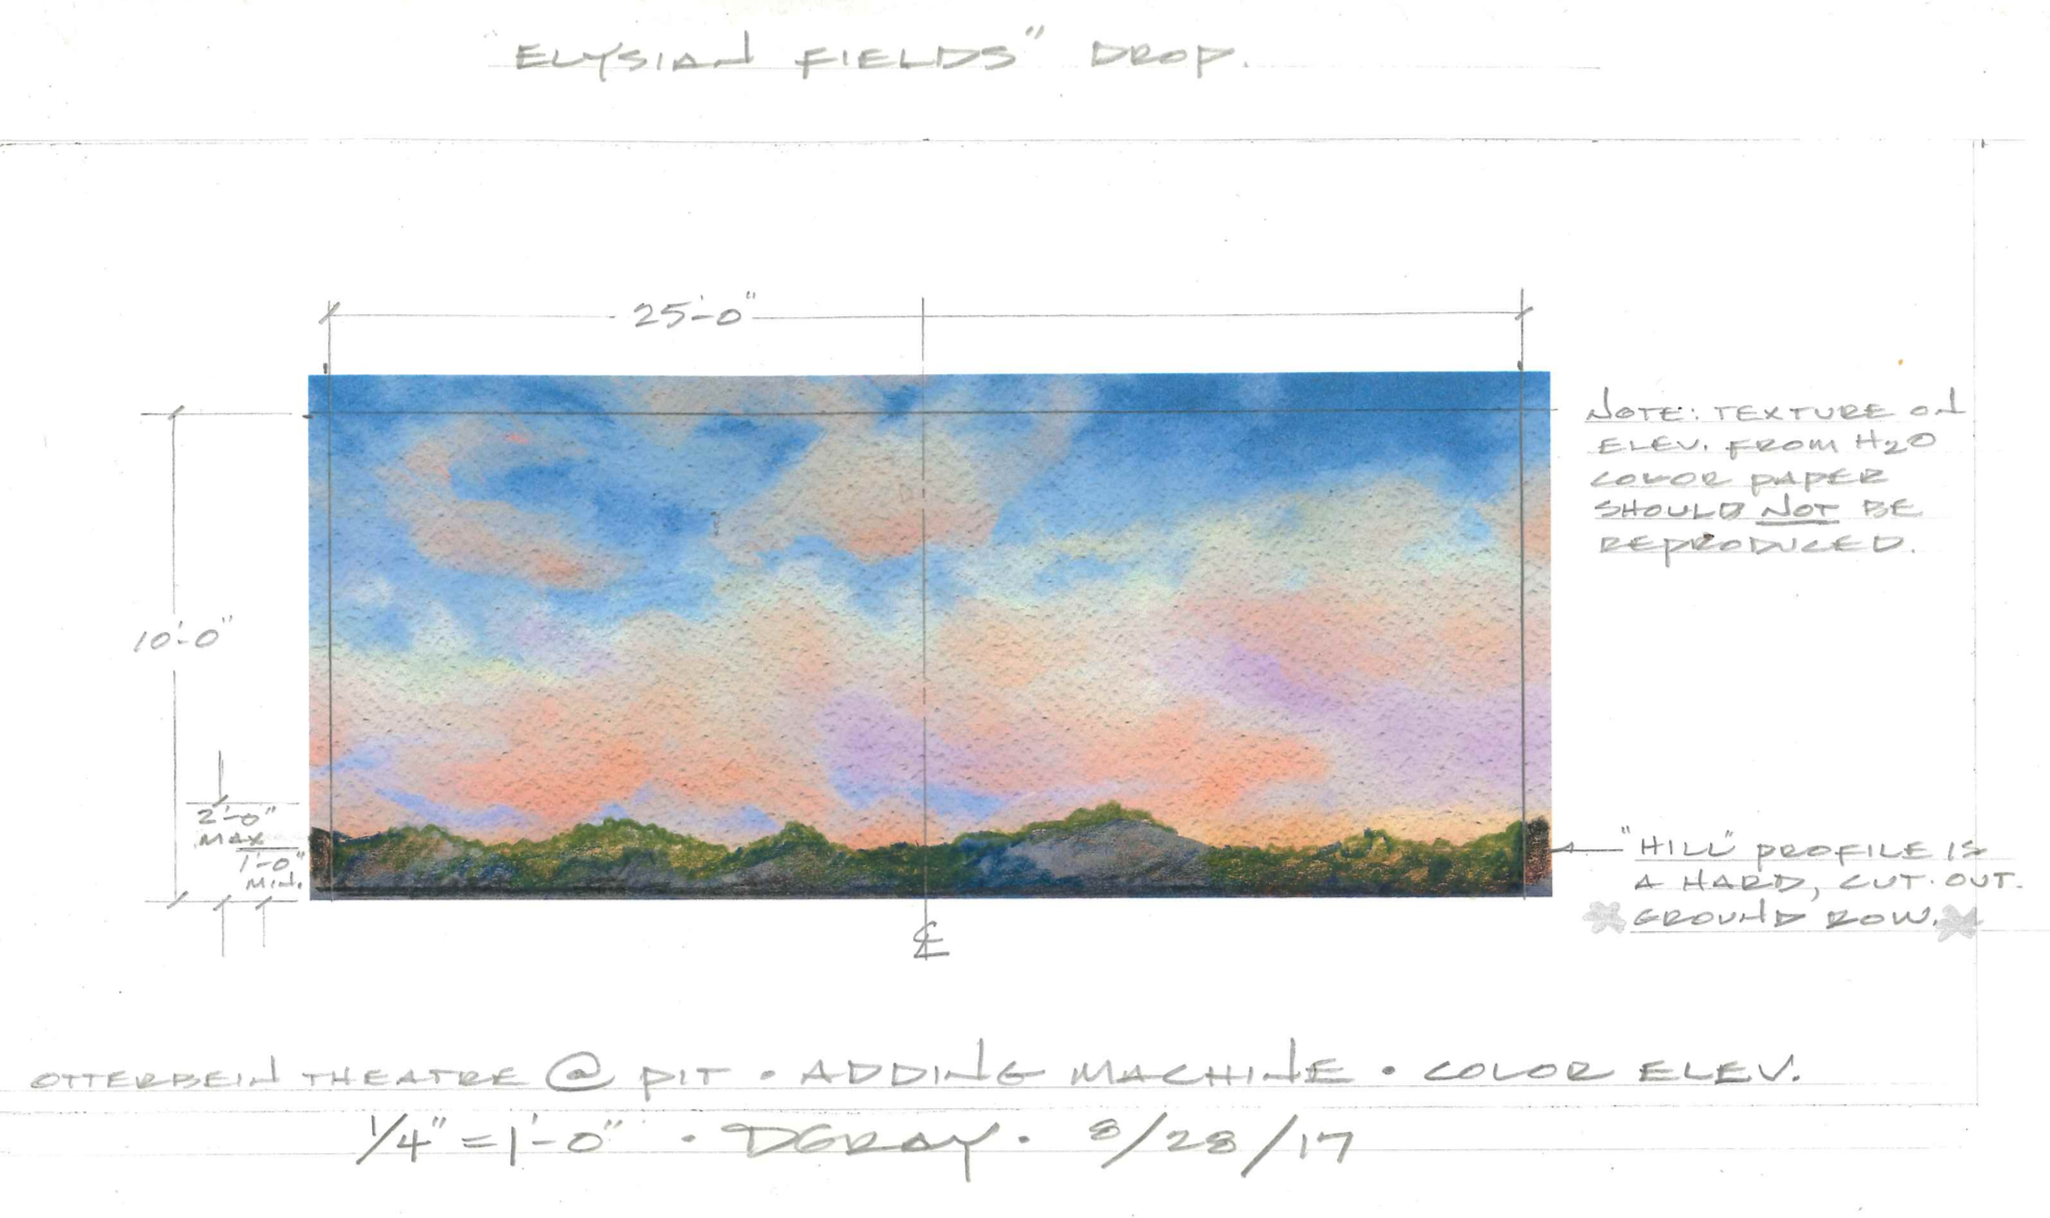 Backdrop paint elevation